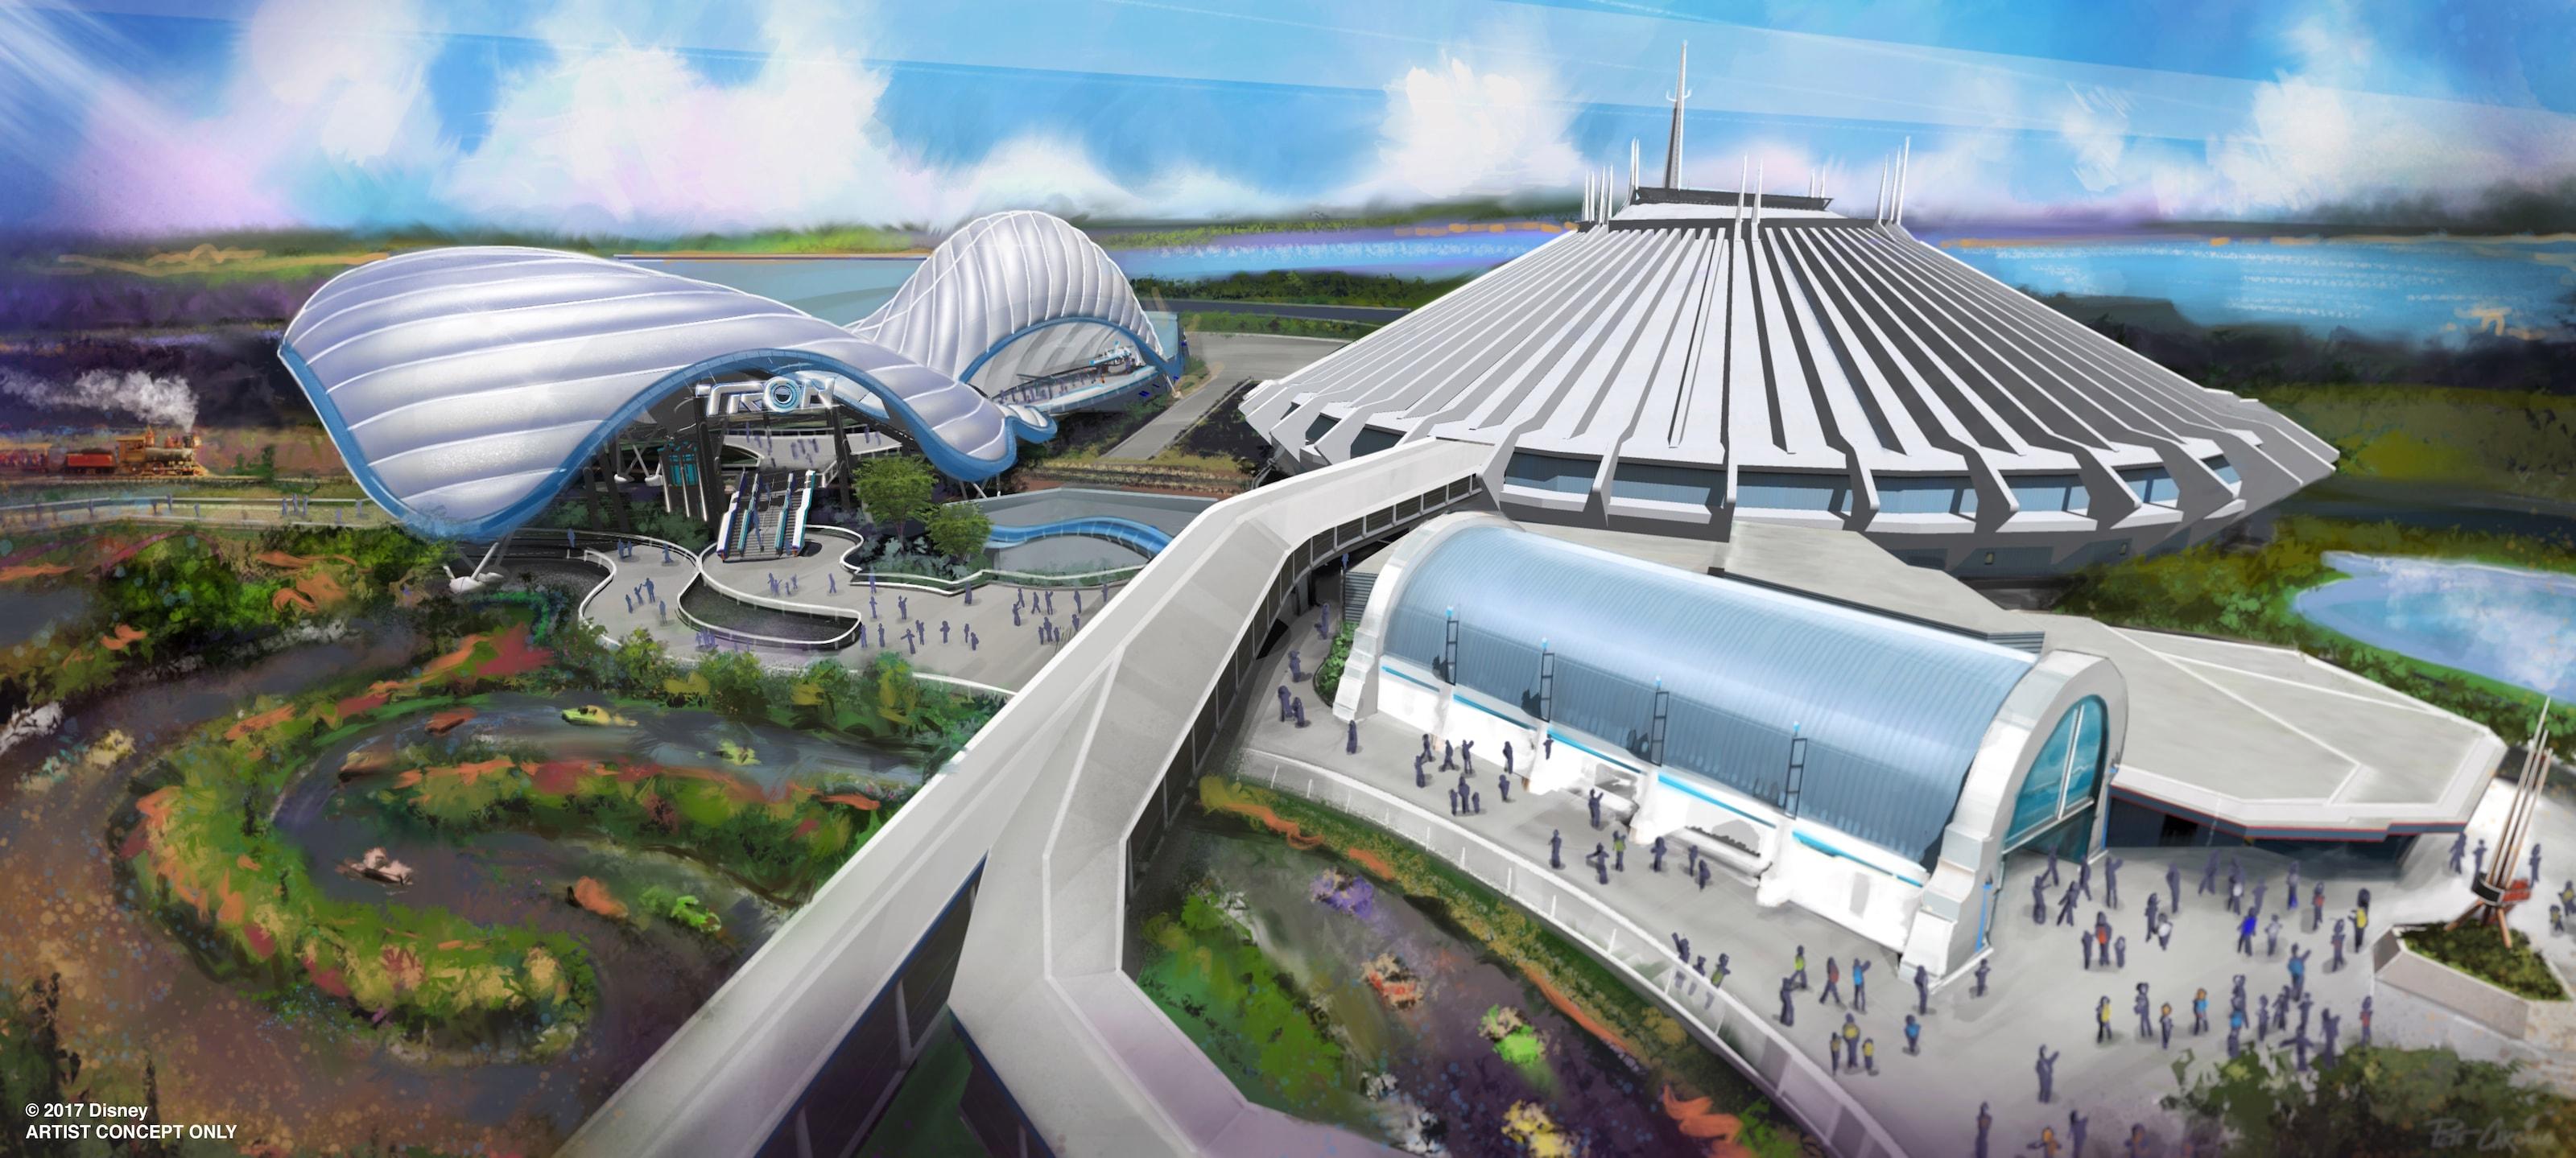 New Tron Attraction Coming To Magic Kingdom Park At Walt Disney World Resort Disney Parks Blog